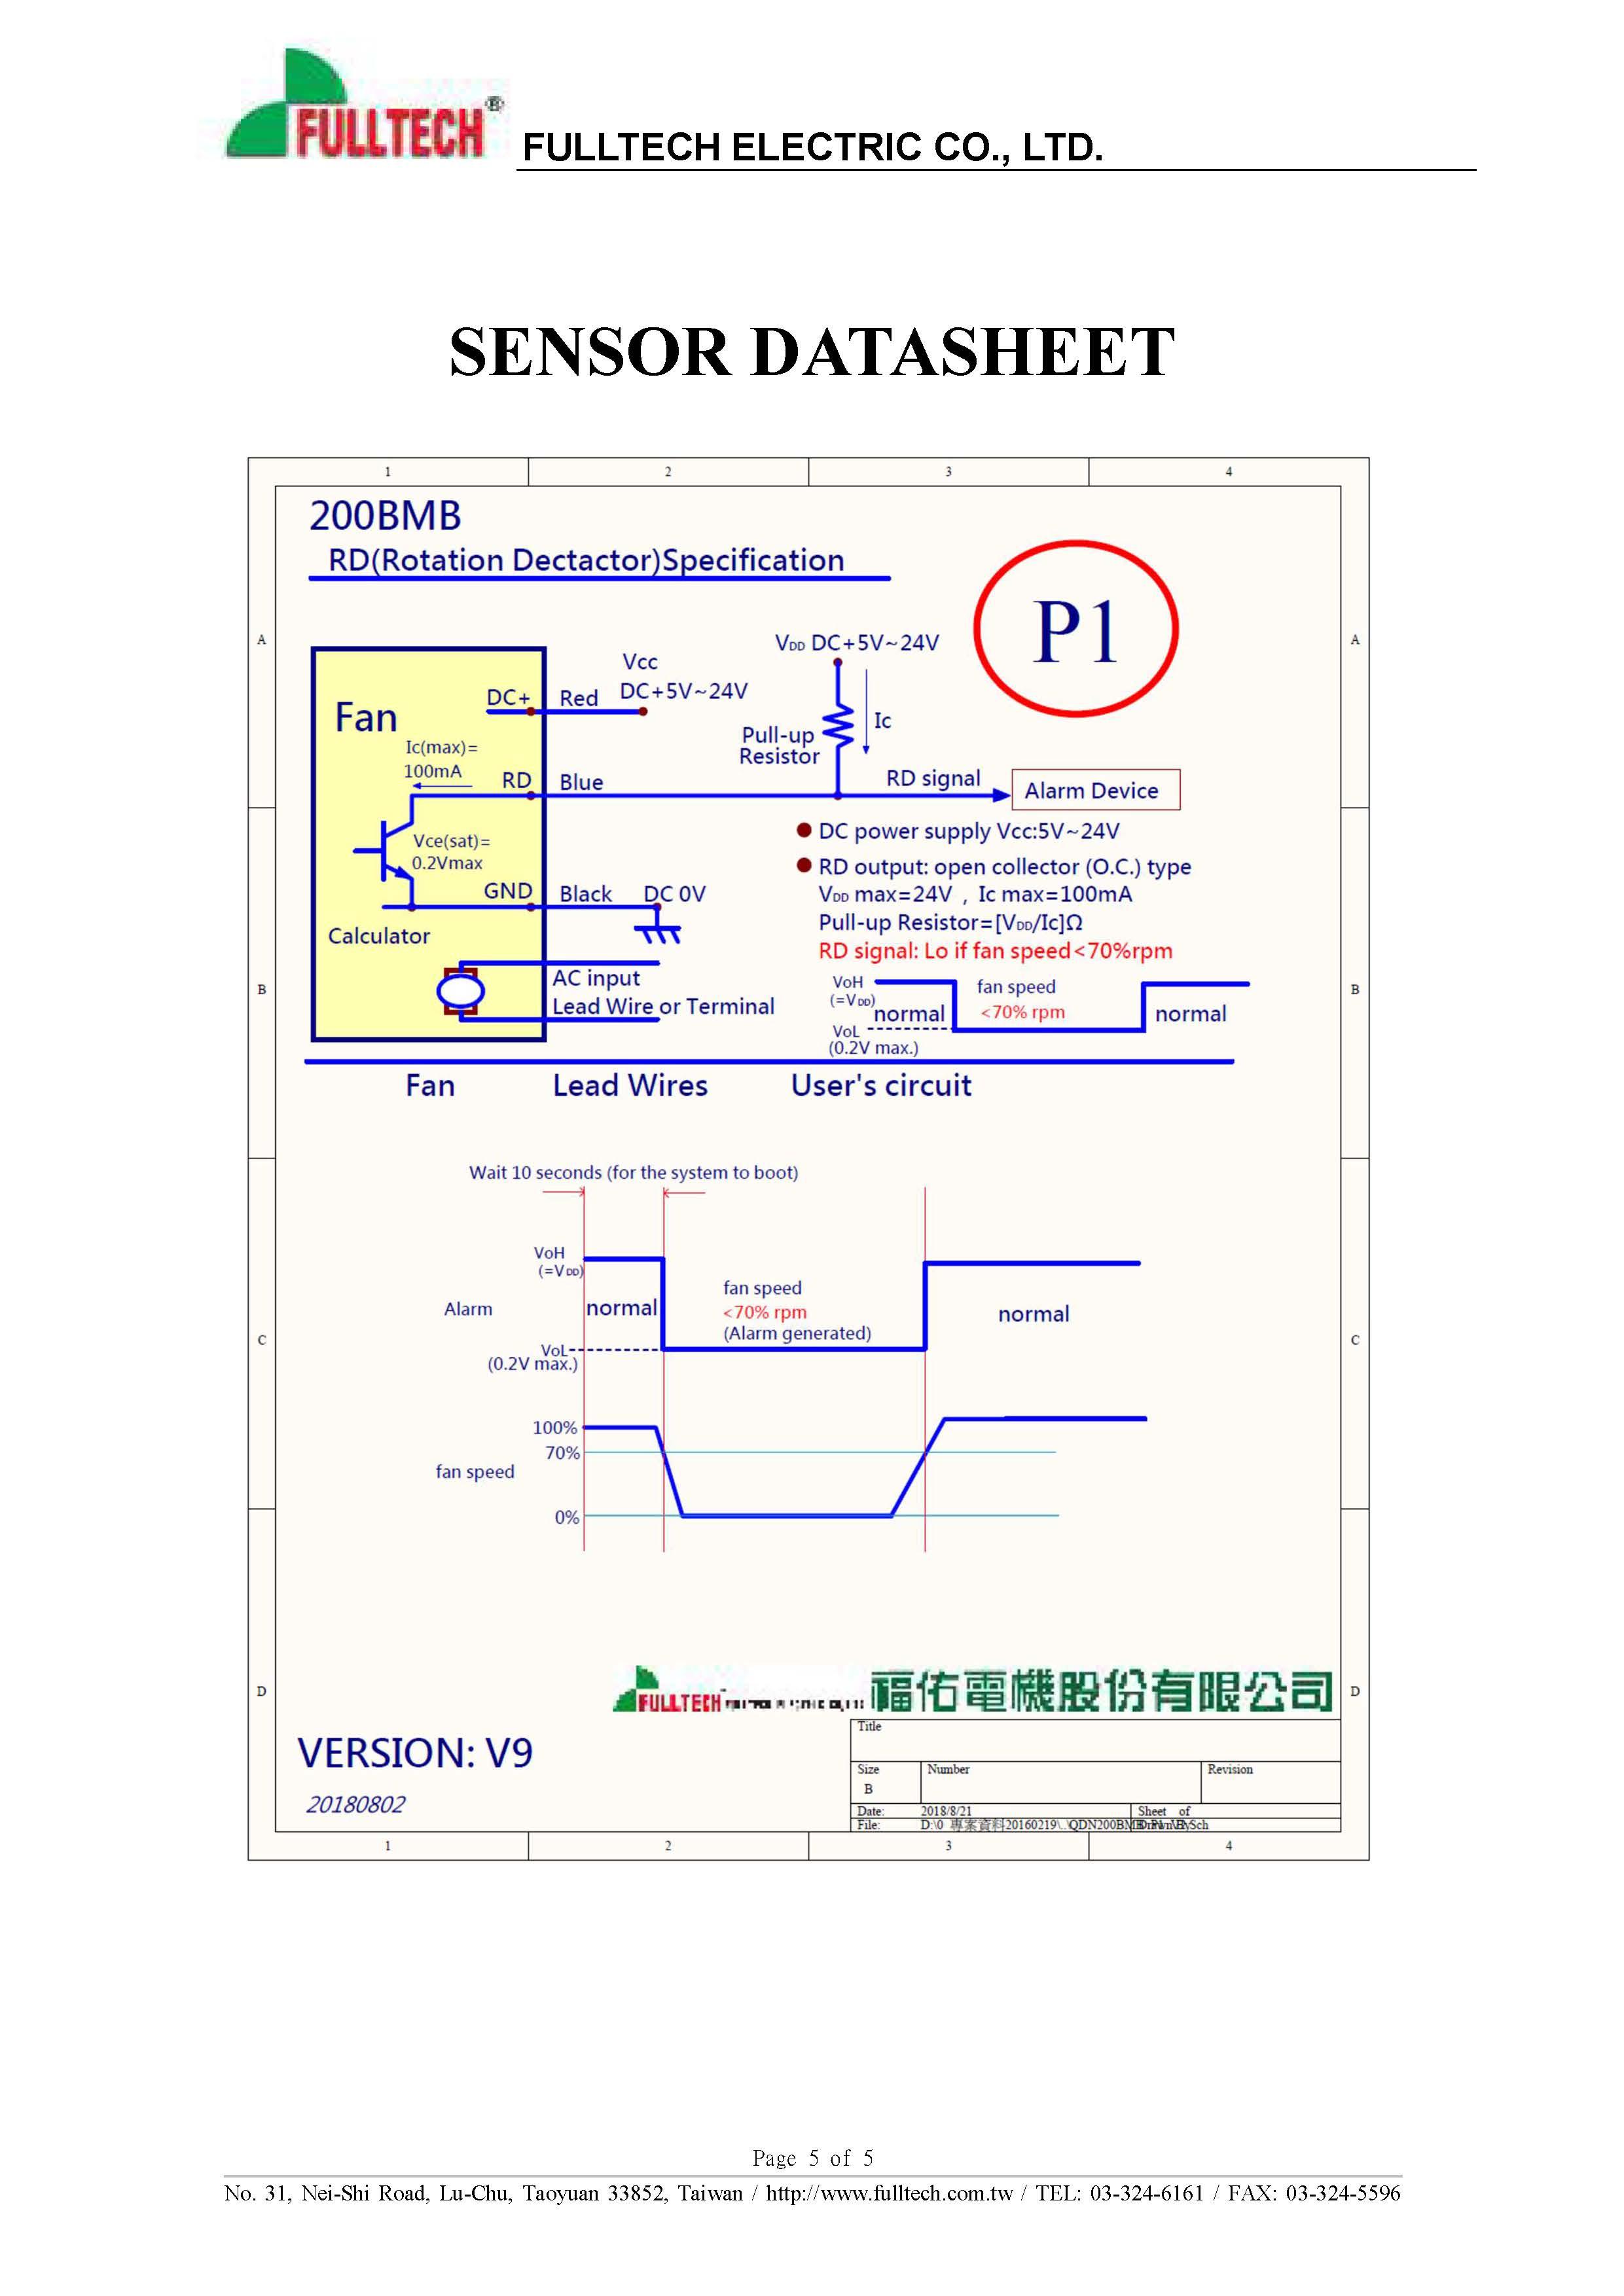 UF200BMB23H1C2A-P1 Data sheet_페이지_5.jpg